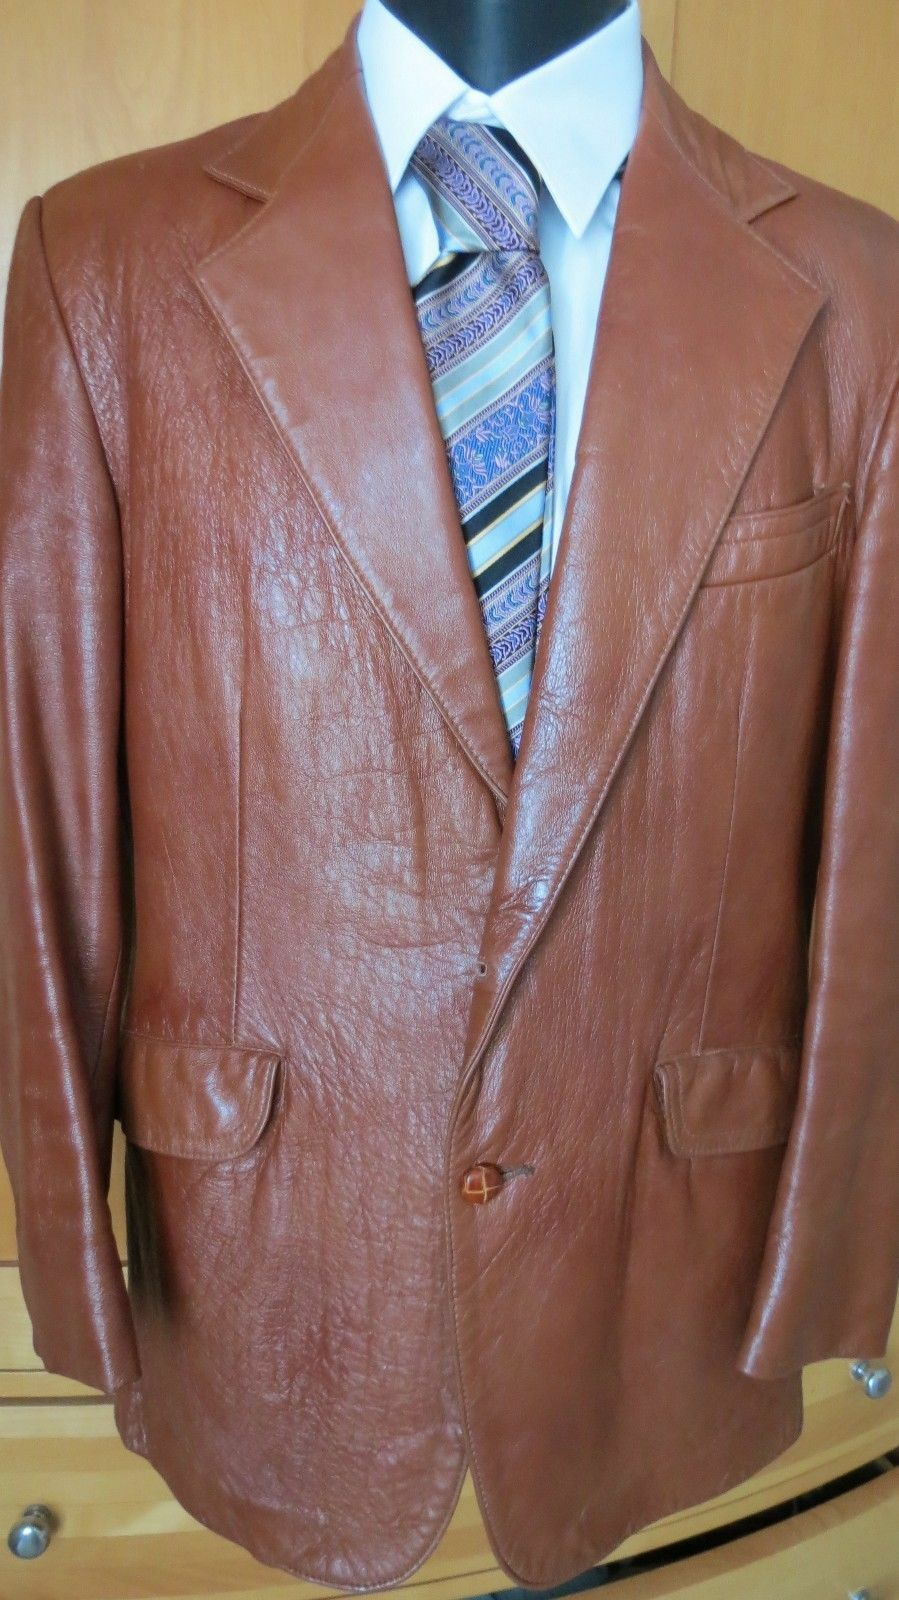 Vtg Angel Skin Cabretta Grais  70's Russet Soft Leather Blazer Sports Coat 38 R